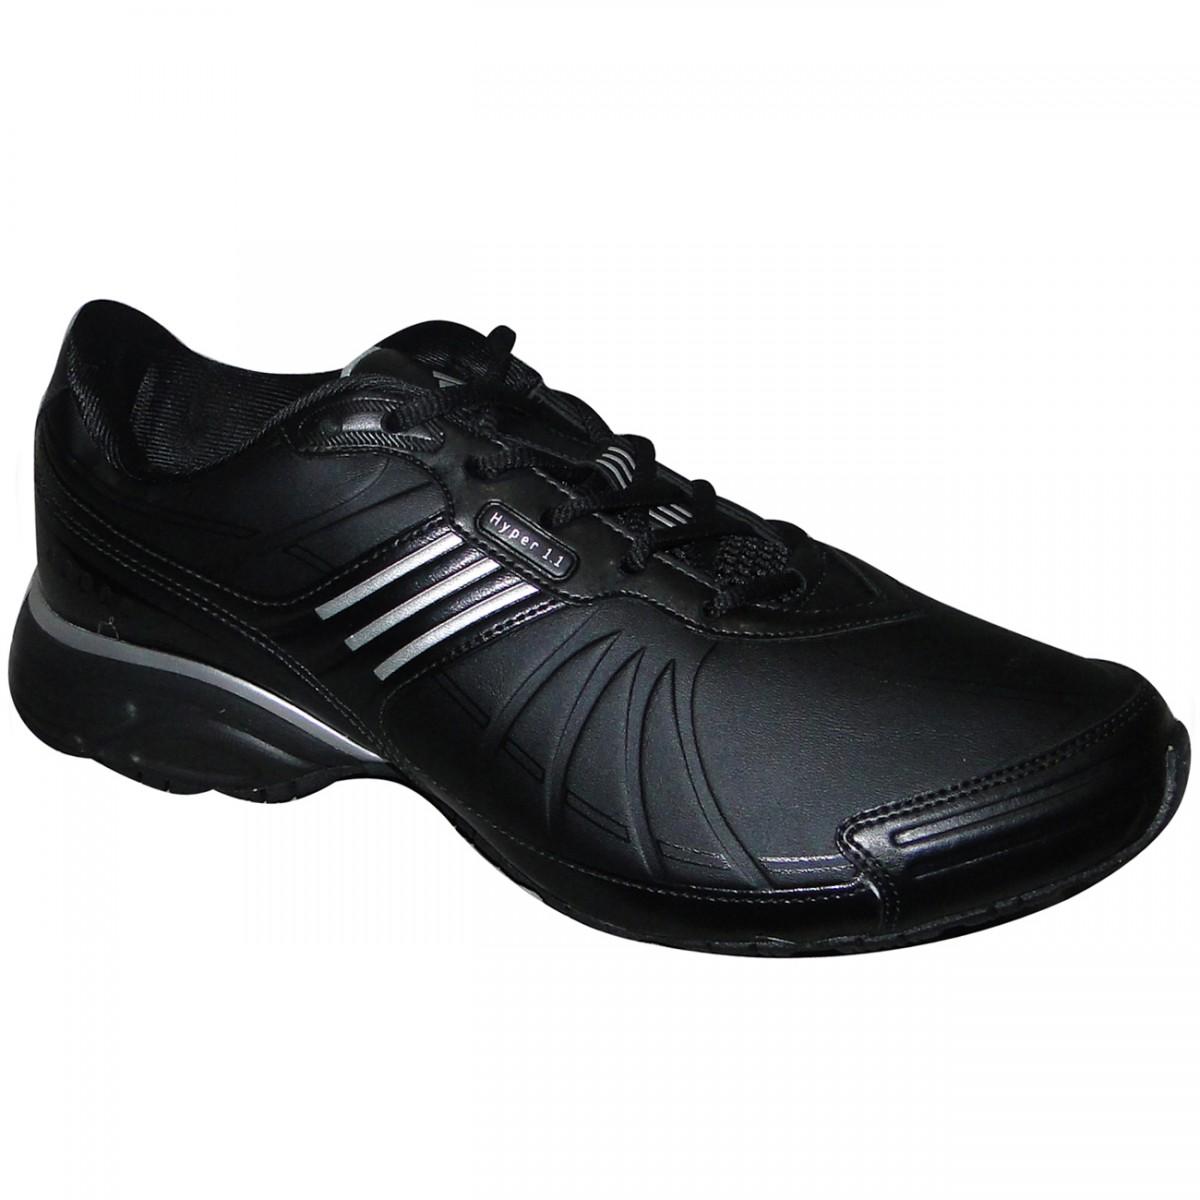 639a02cb518 TENIS ADIDAS HYPER 1.1 3006 - PRETO PRATA - Chuteira Nike